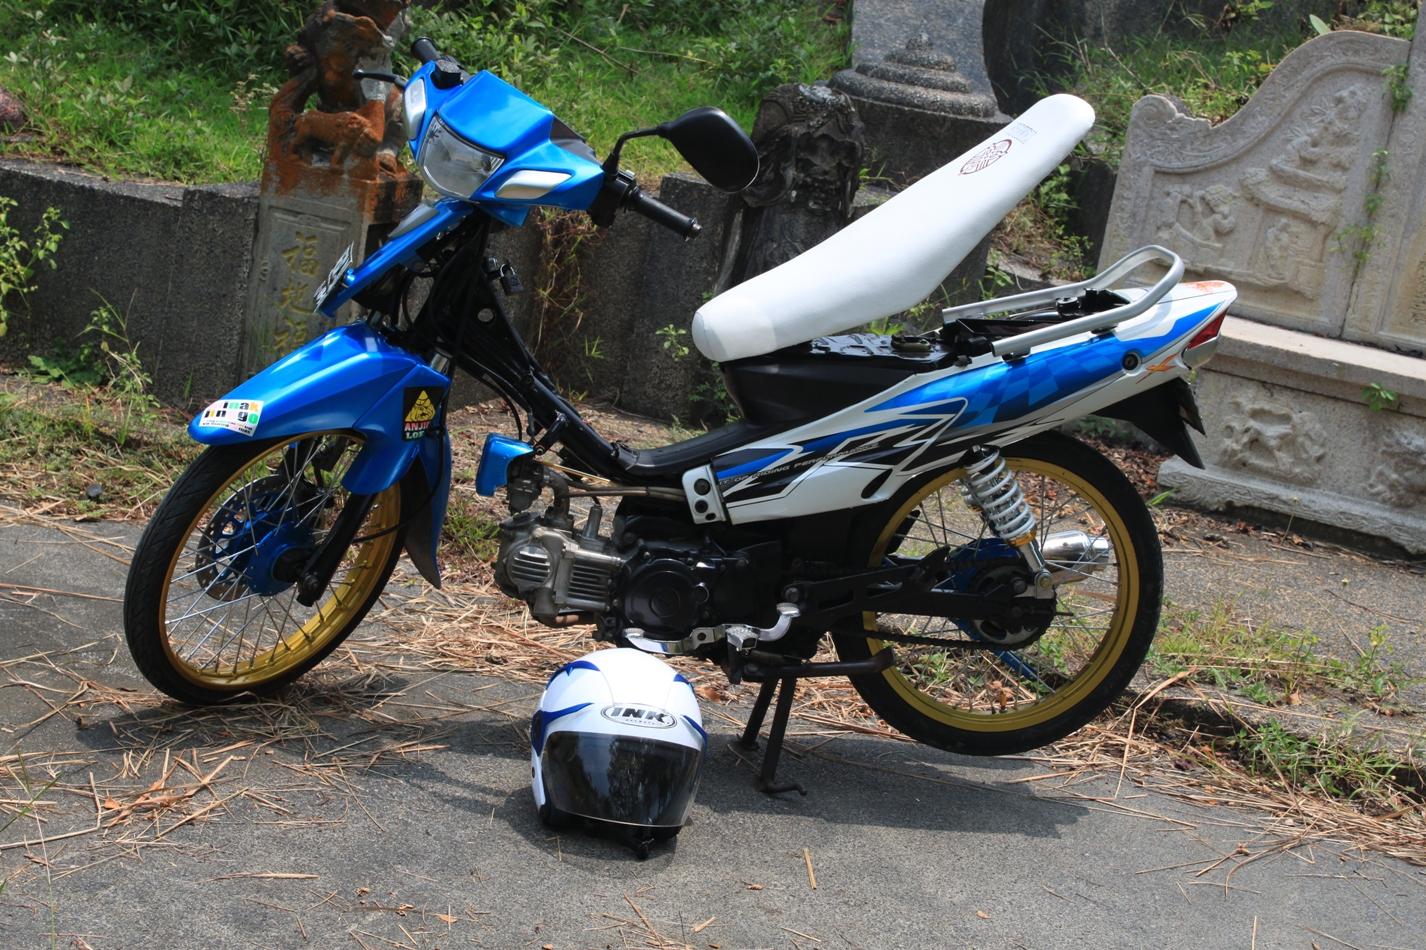 Modif Yamaha F1 Zr